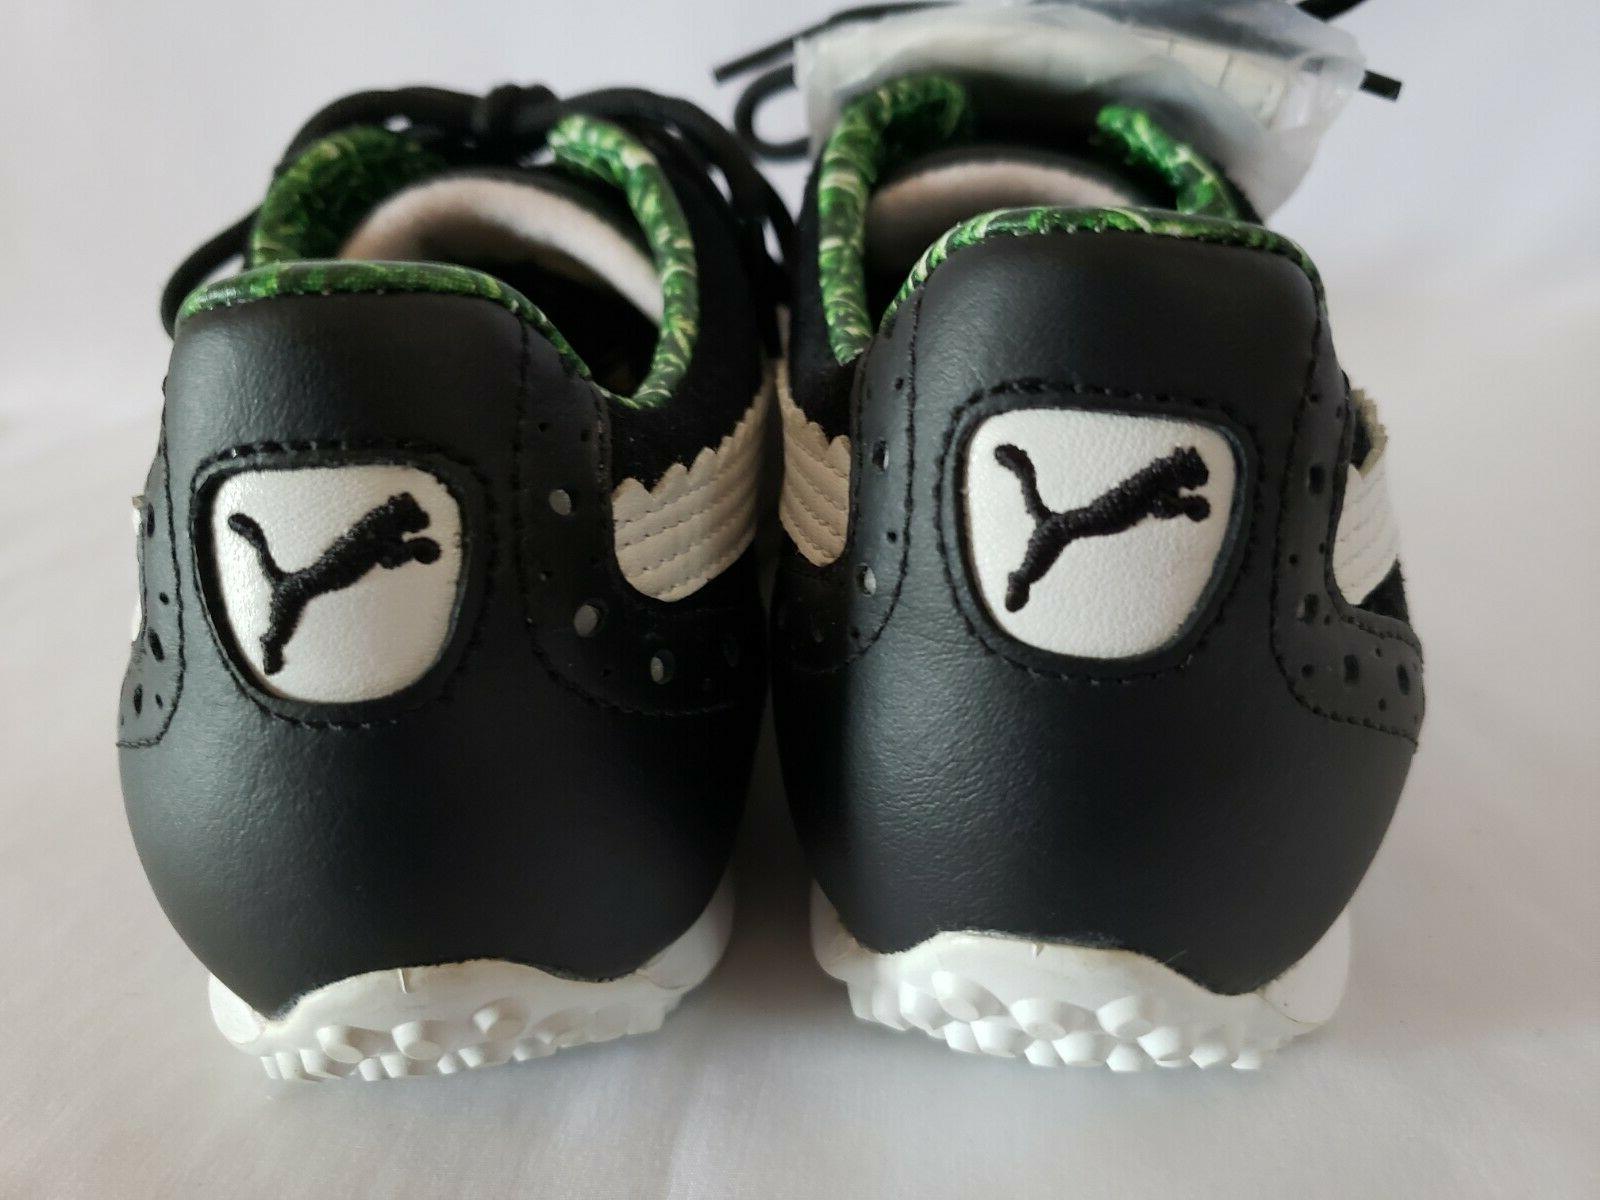 PUMA Oxford Shoes Kiltie NEW! 8